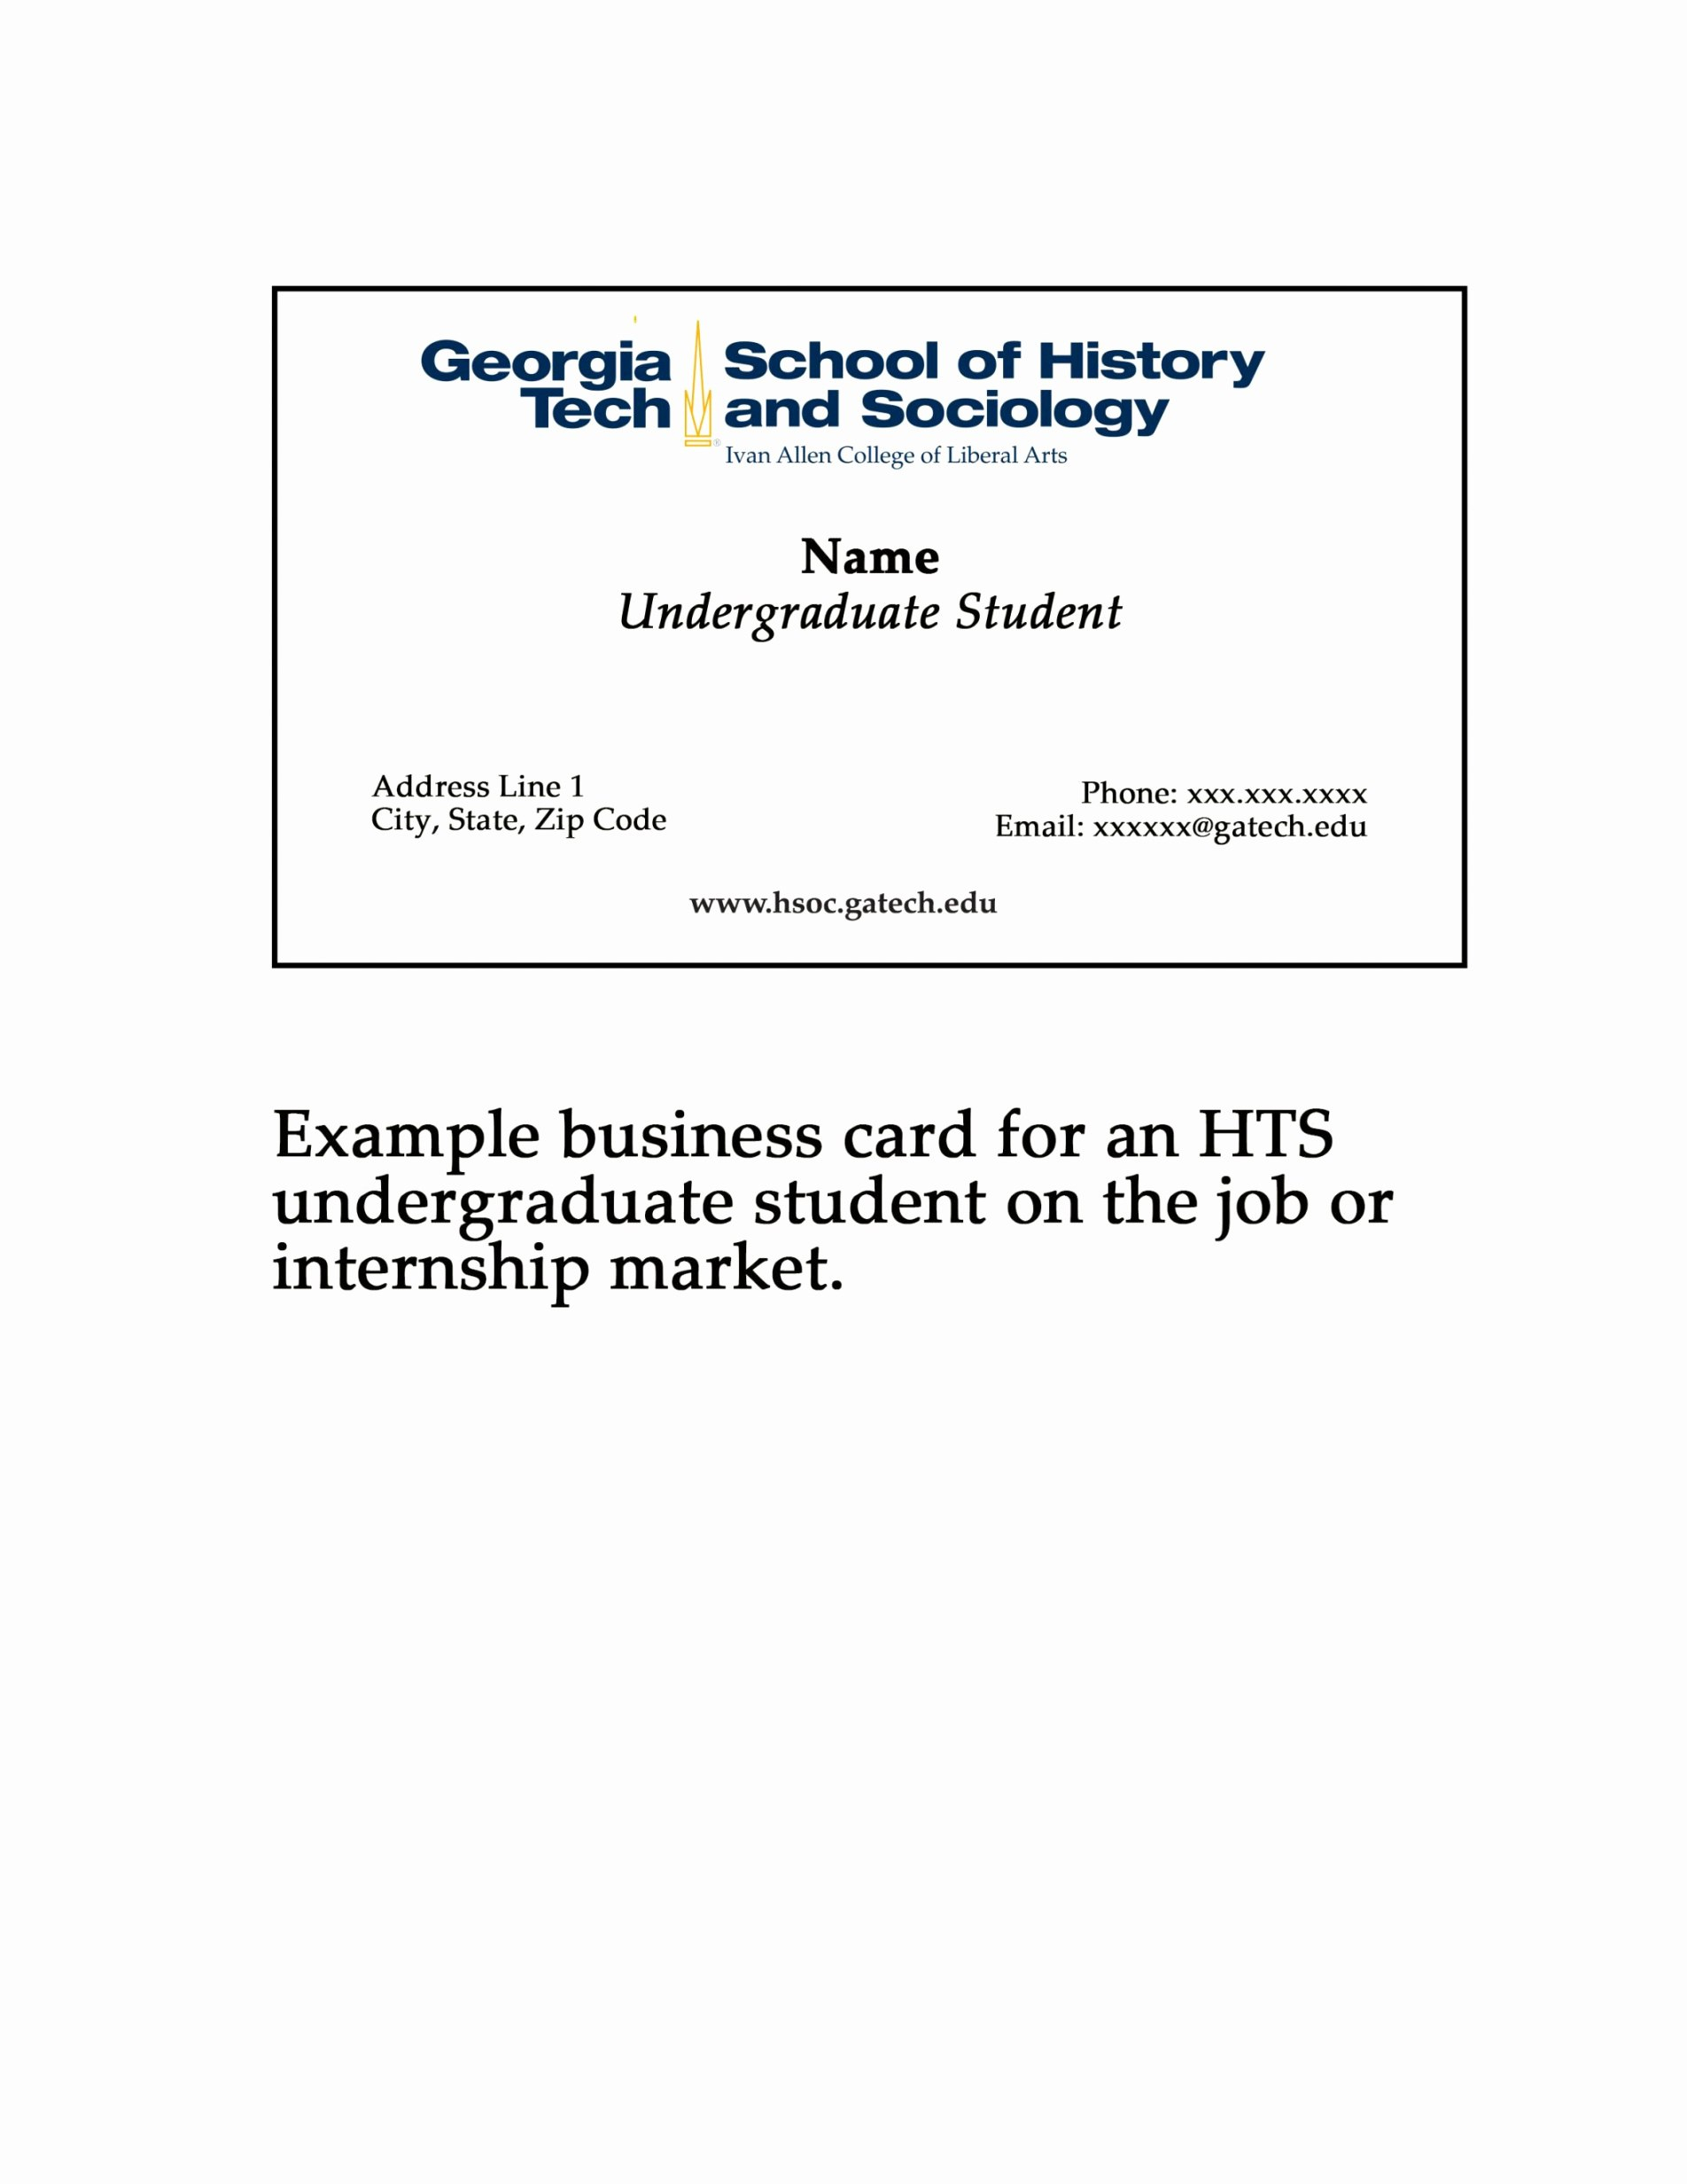 Chinese Business Card Template – Guiaubuntupt With Regard To Student Business Card Template